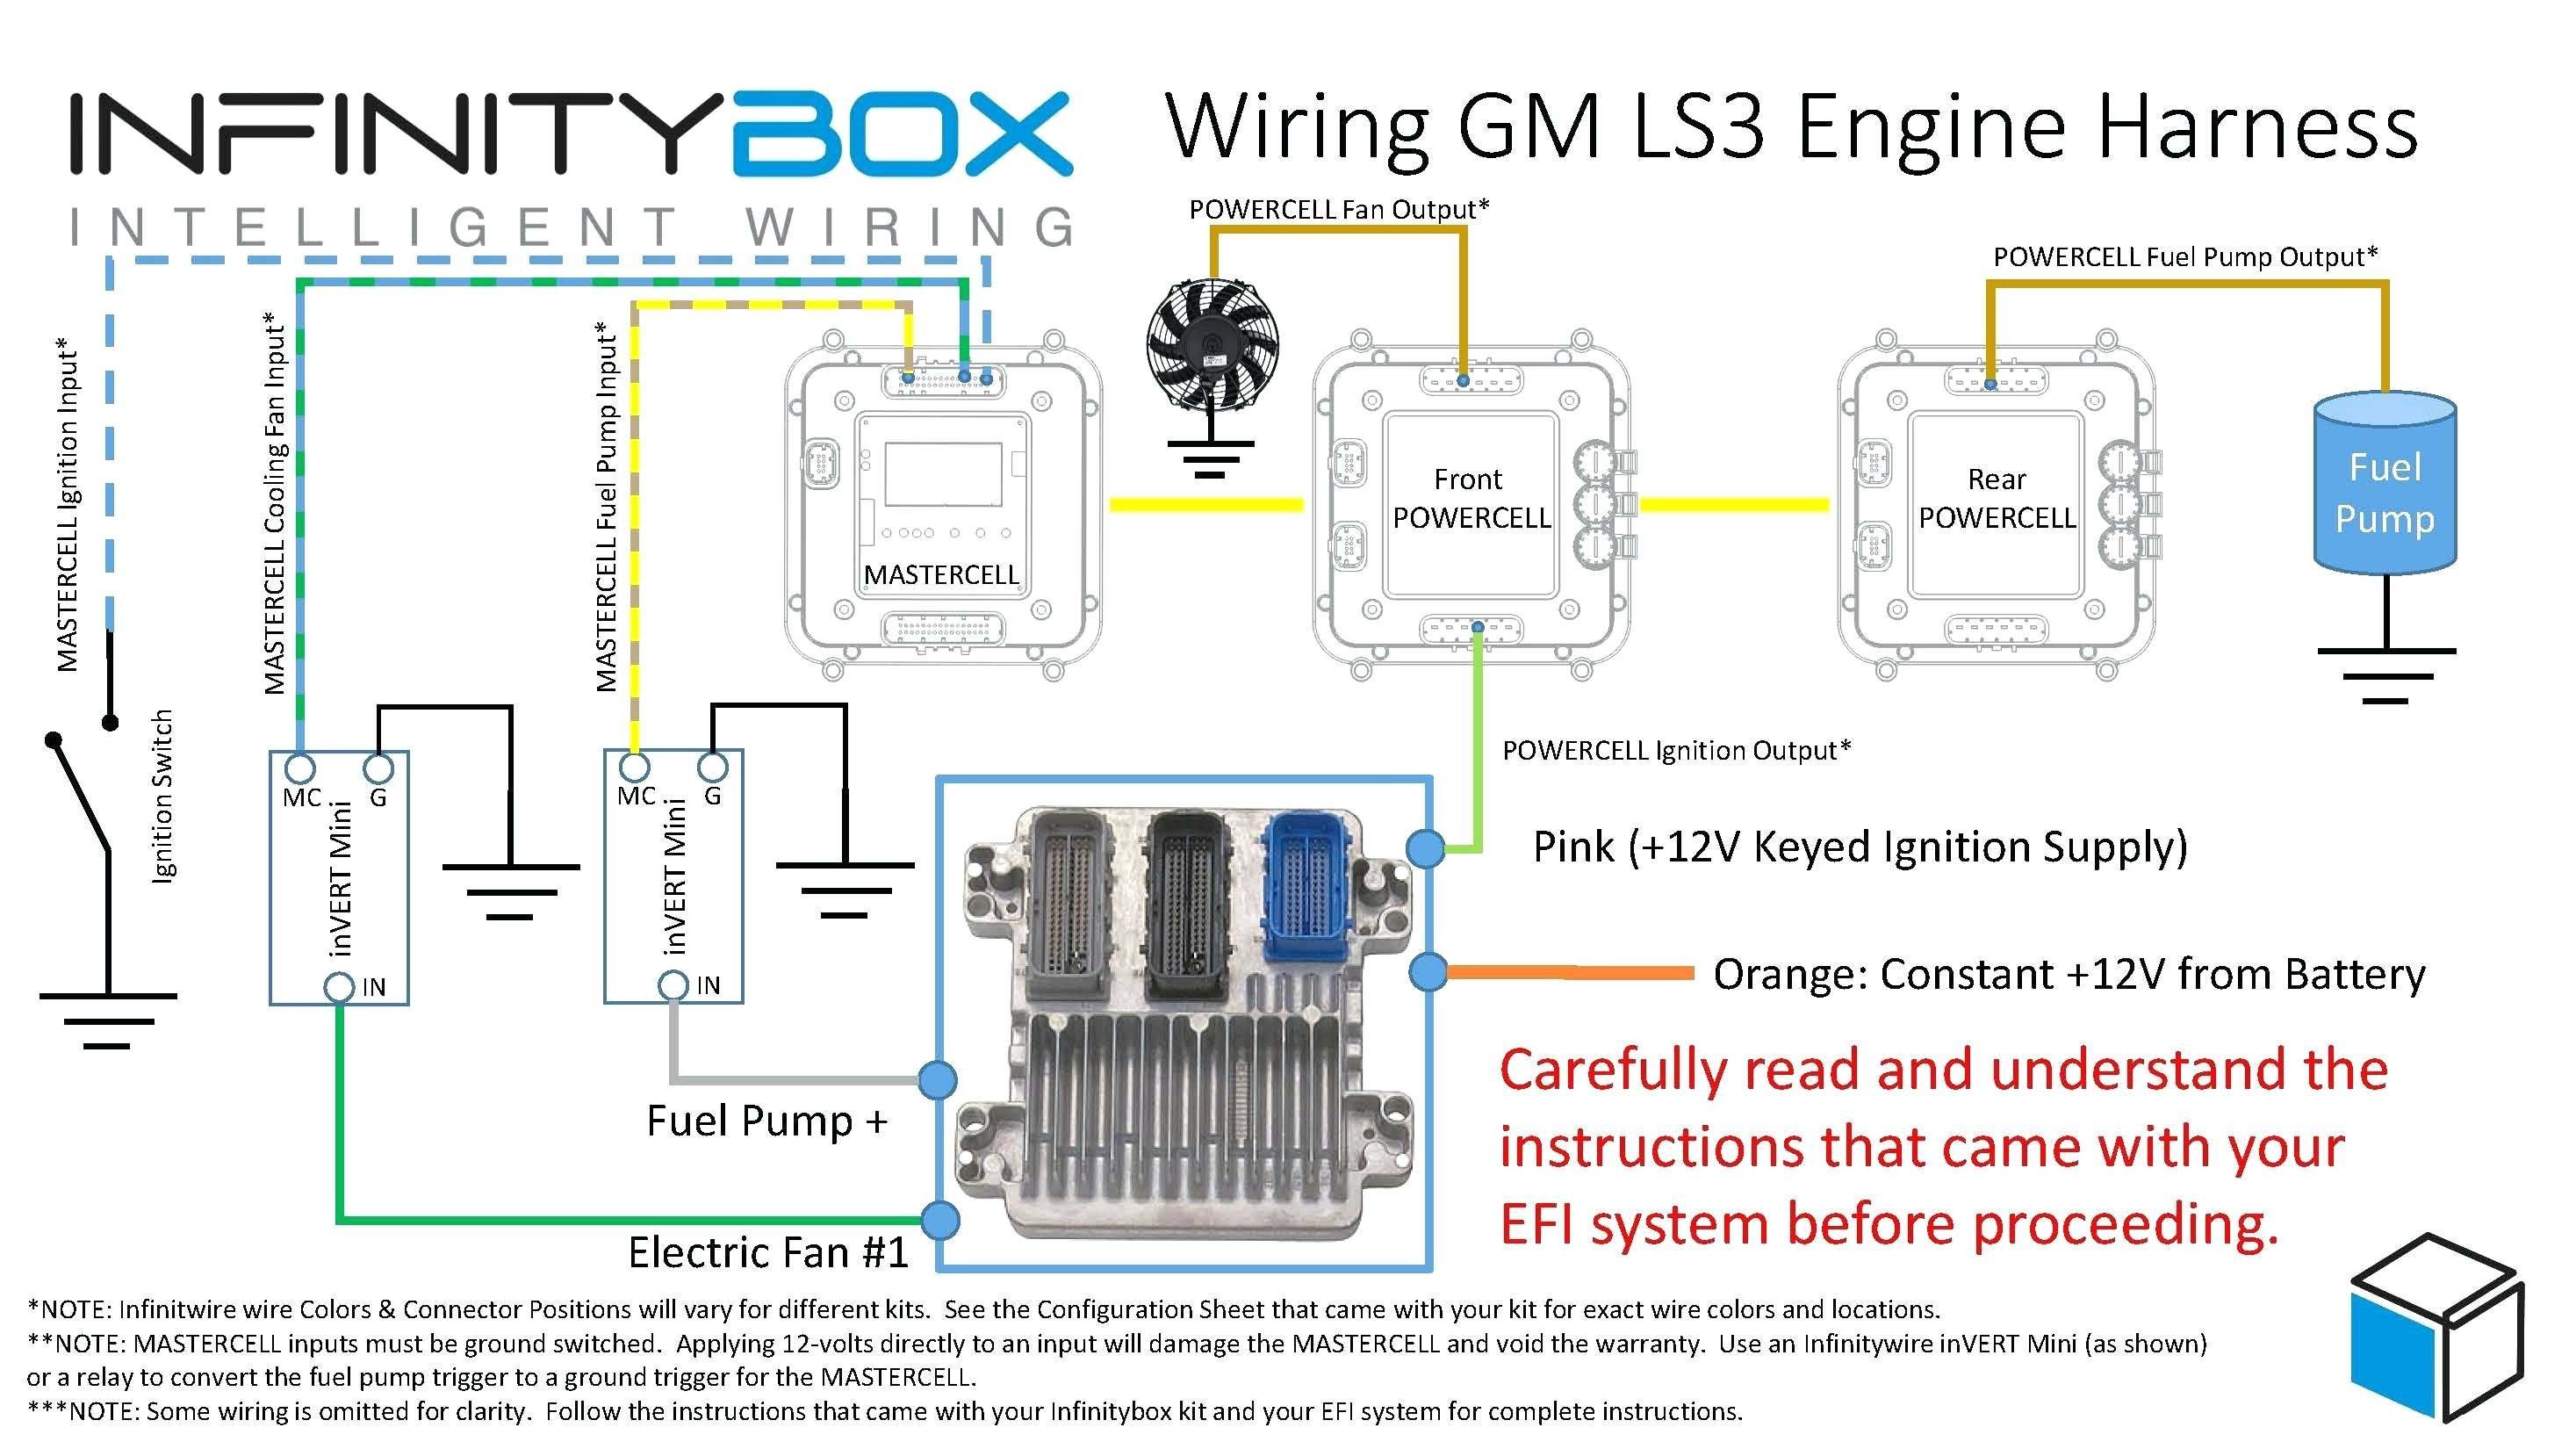 Wiring Diagram For Pioneer Avh X2800Bs | Manual E-Books - Pioneer Avh X2800Bs Wiring Diagram